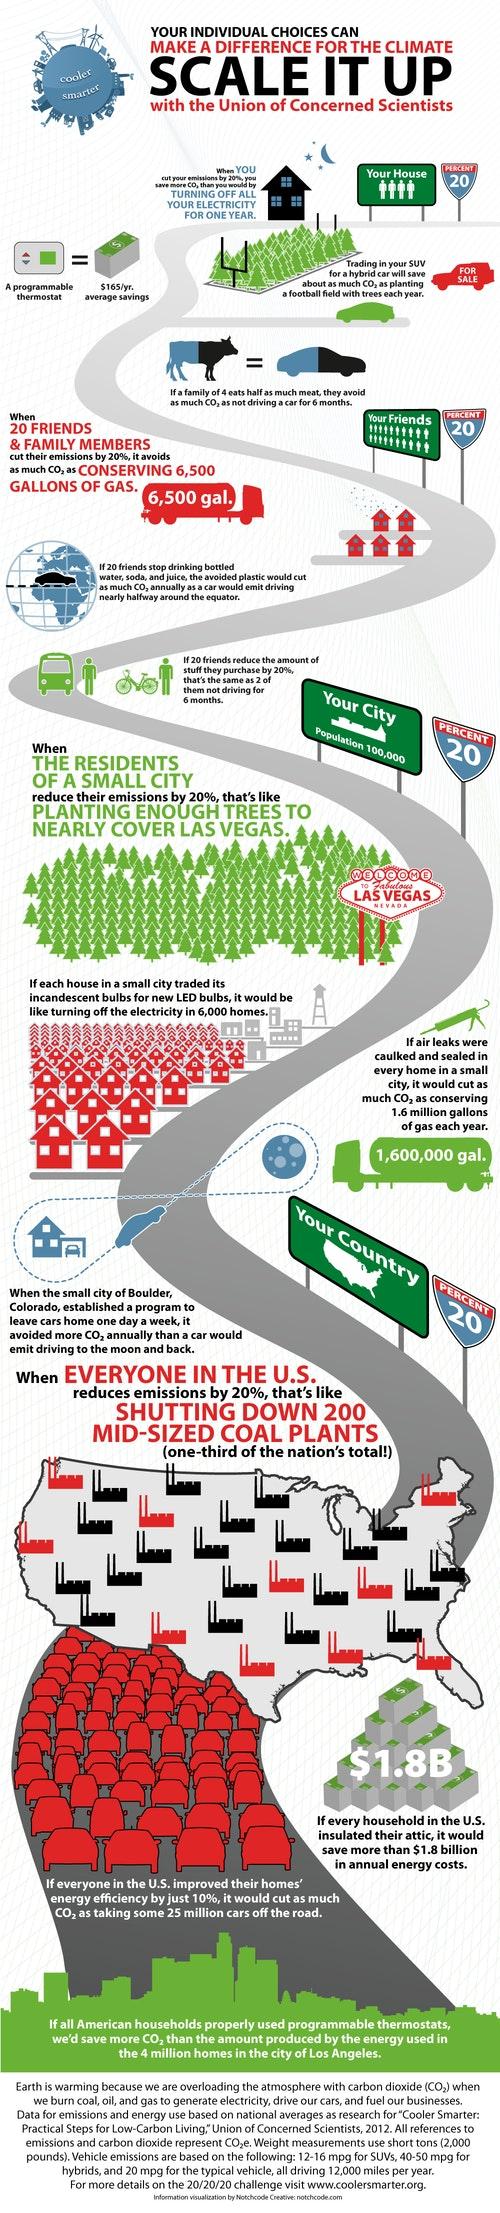 coolersmarter-infographic_(1)